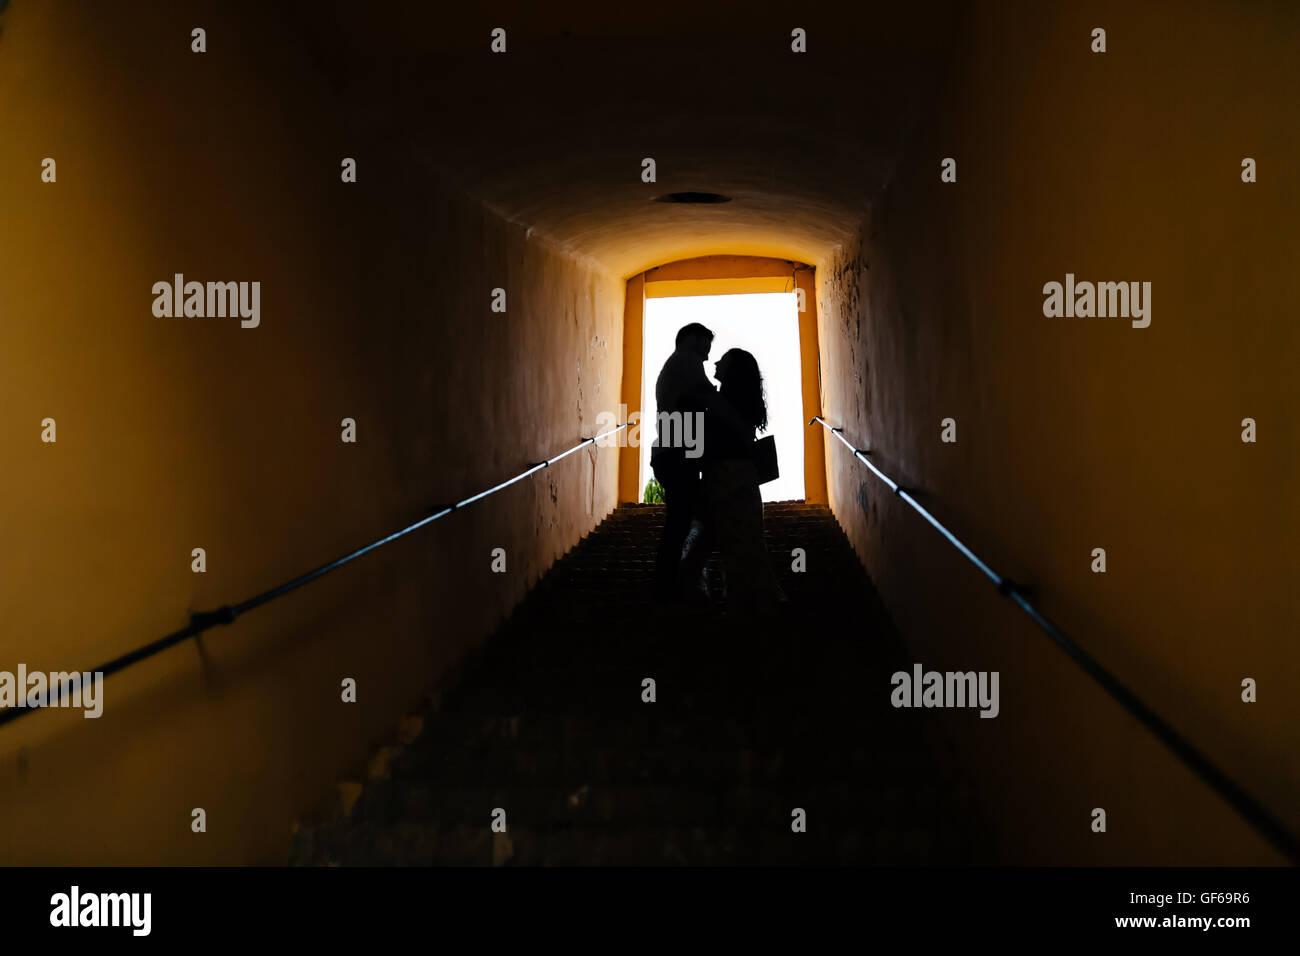 Silhouette d'un couple in love hugging Photo Stock